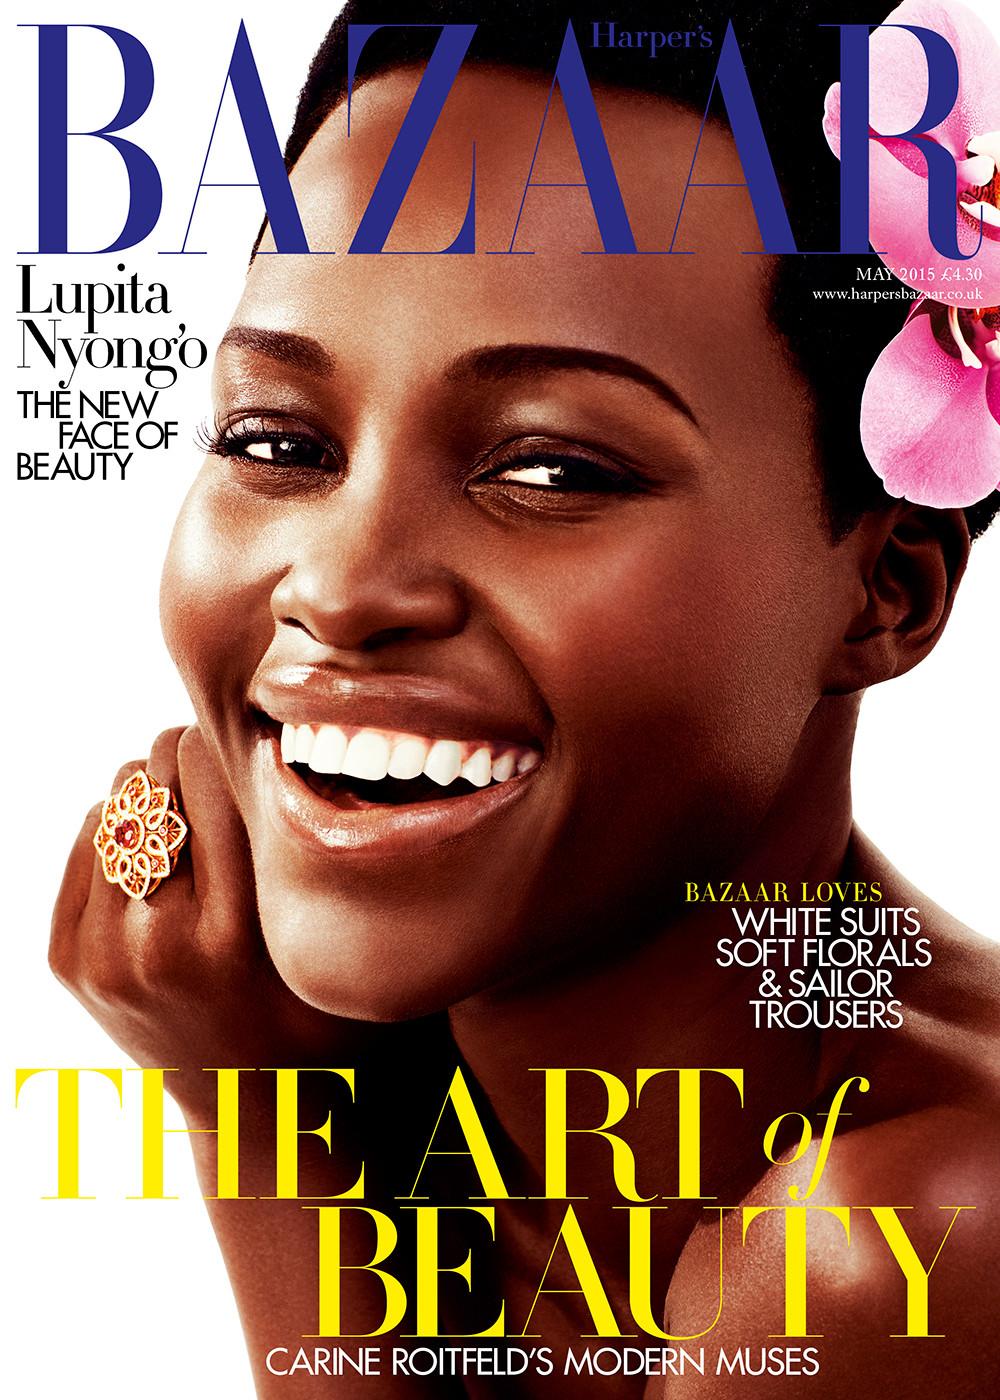 Lupita Nyong'o for Harper's Bazaar